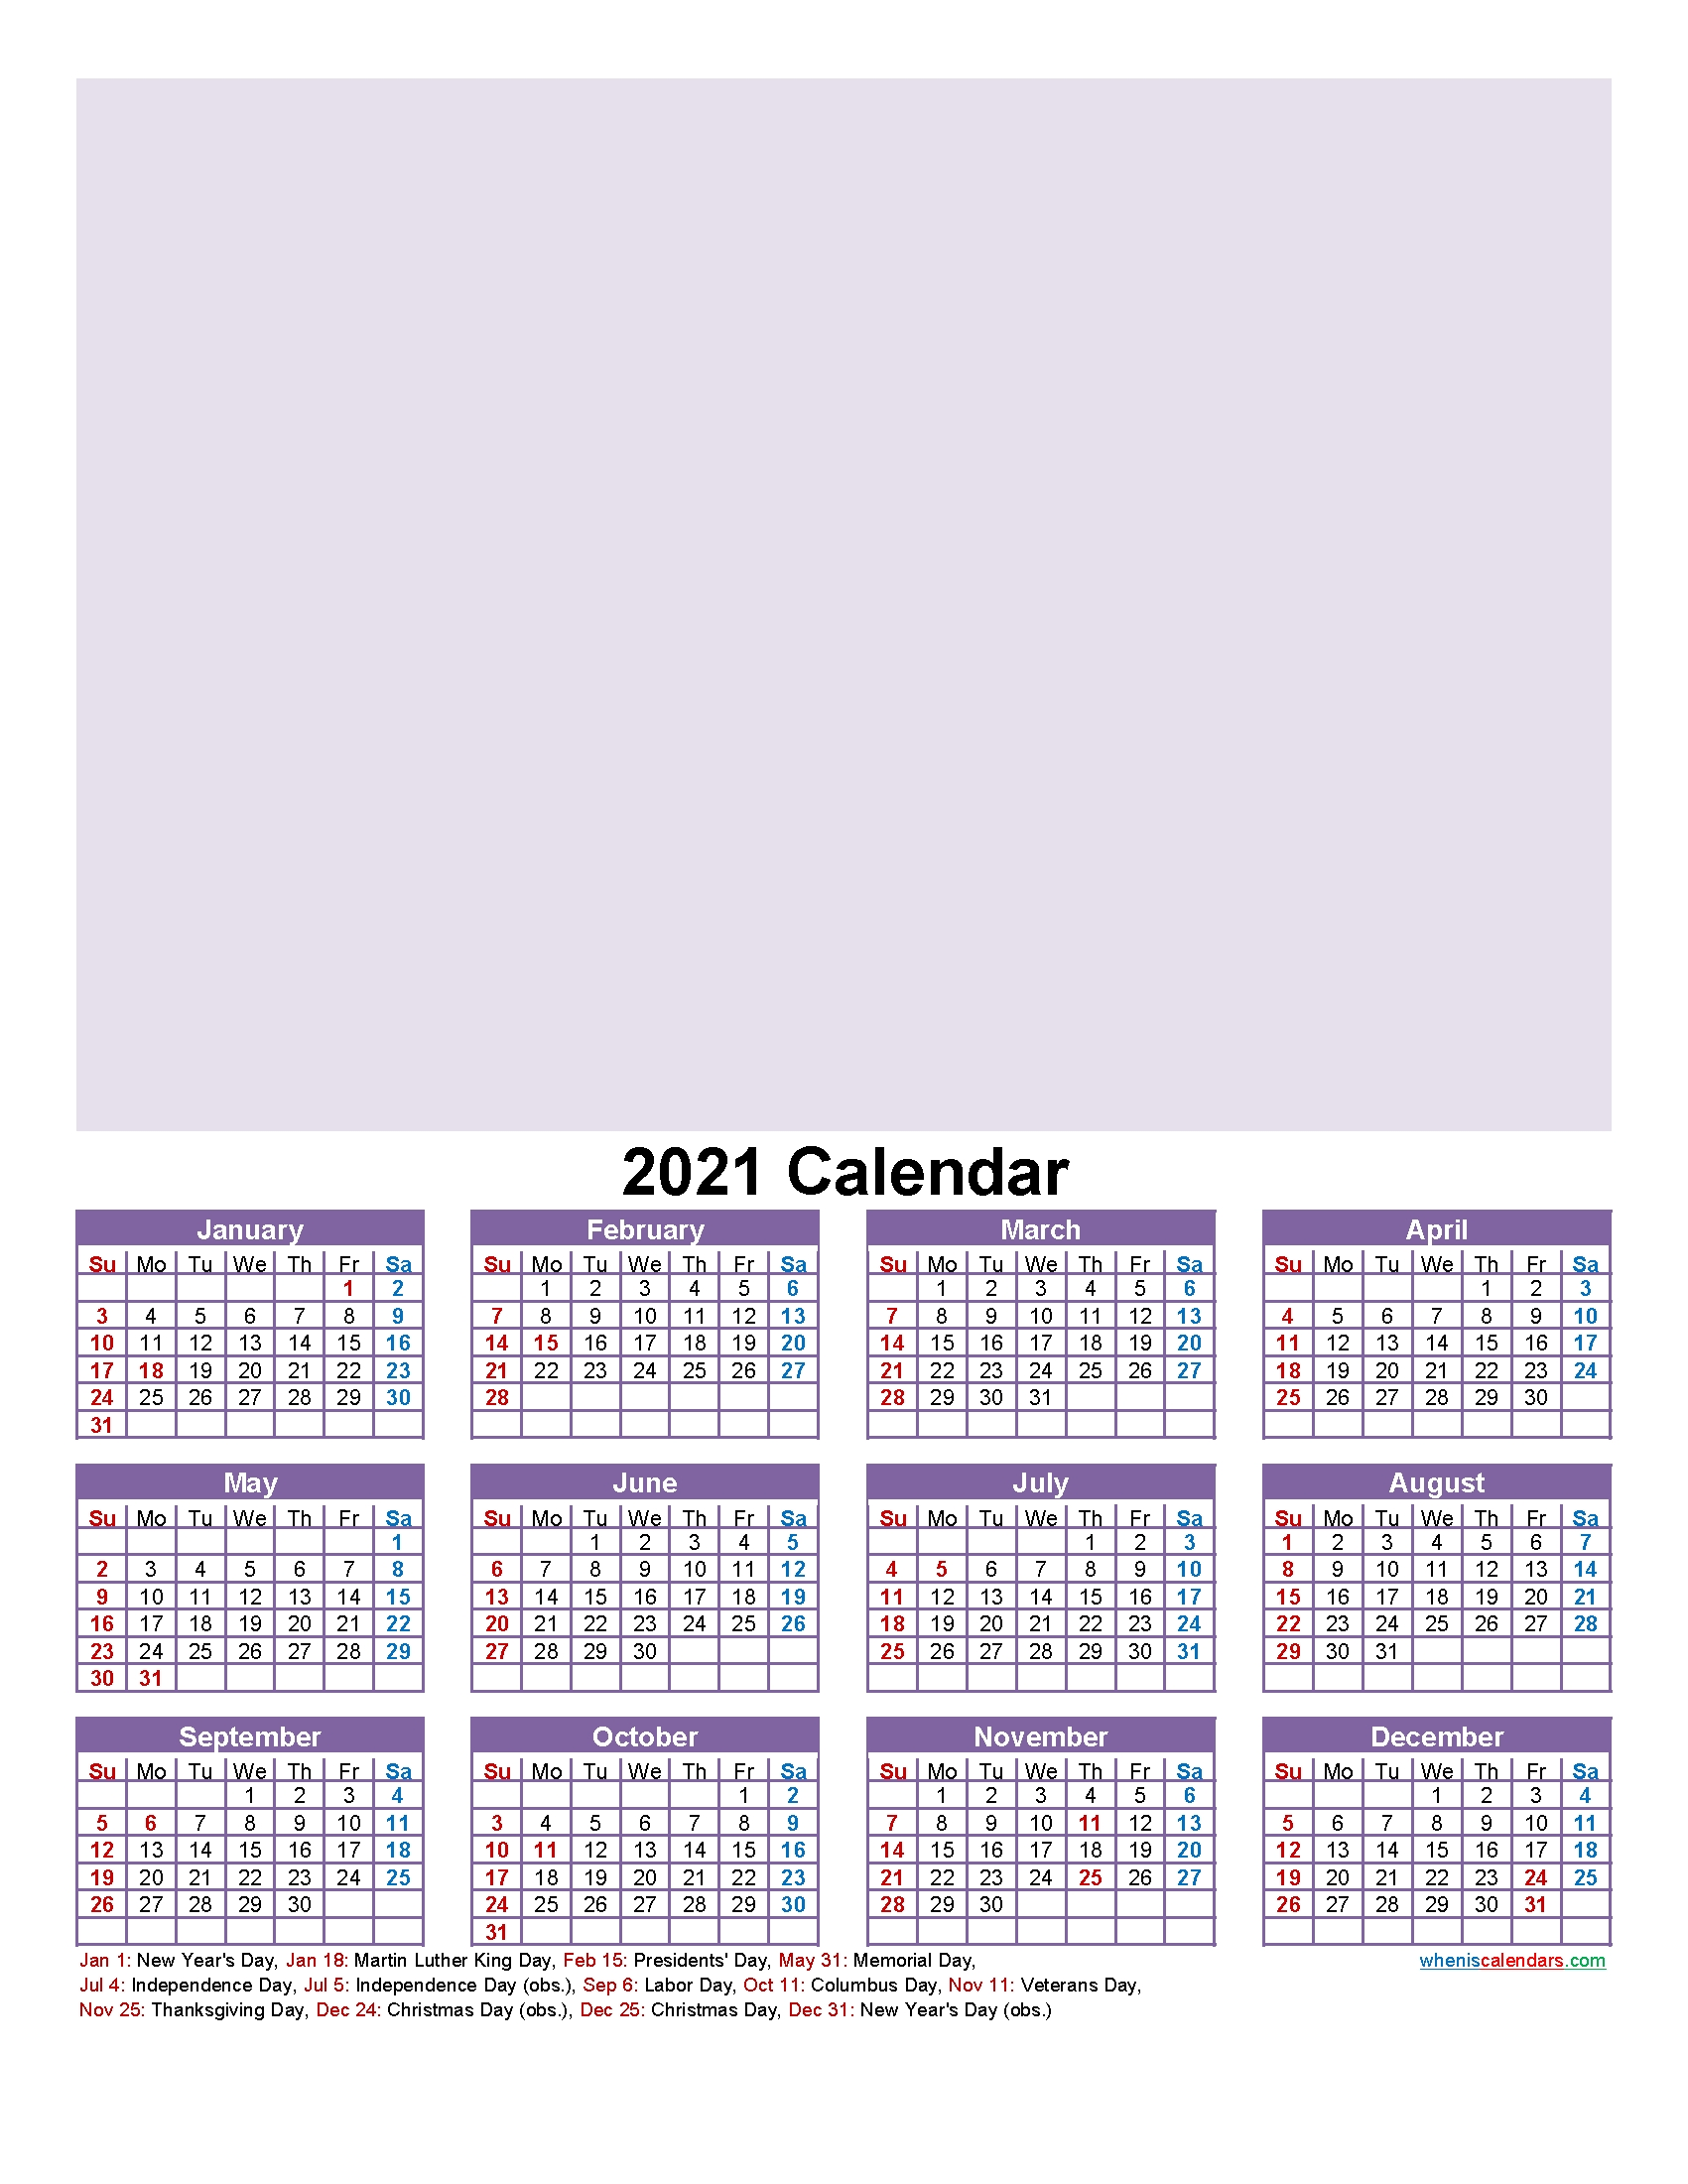 Make Your Own Photo Calendar Free 2021 - Template No.f21Y19 regarding 2021 Portrait Calendar Printable